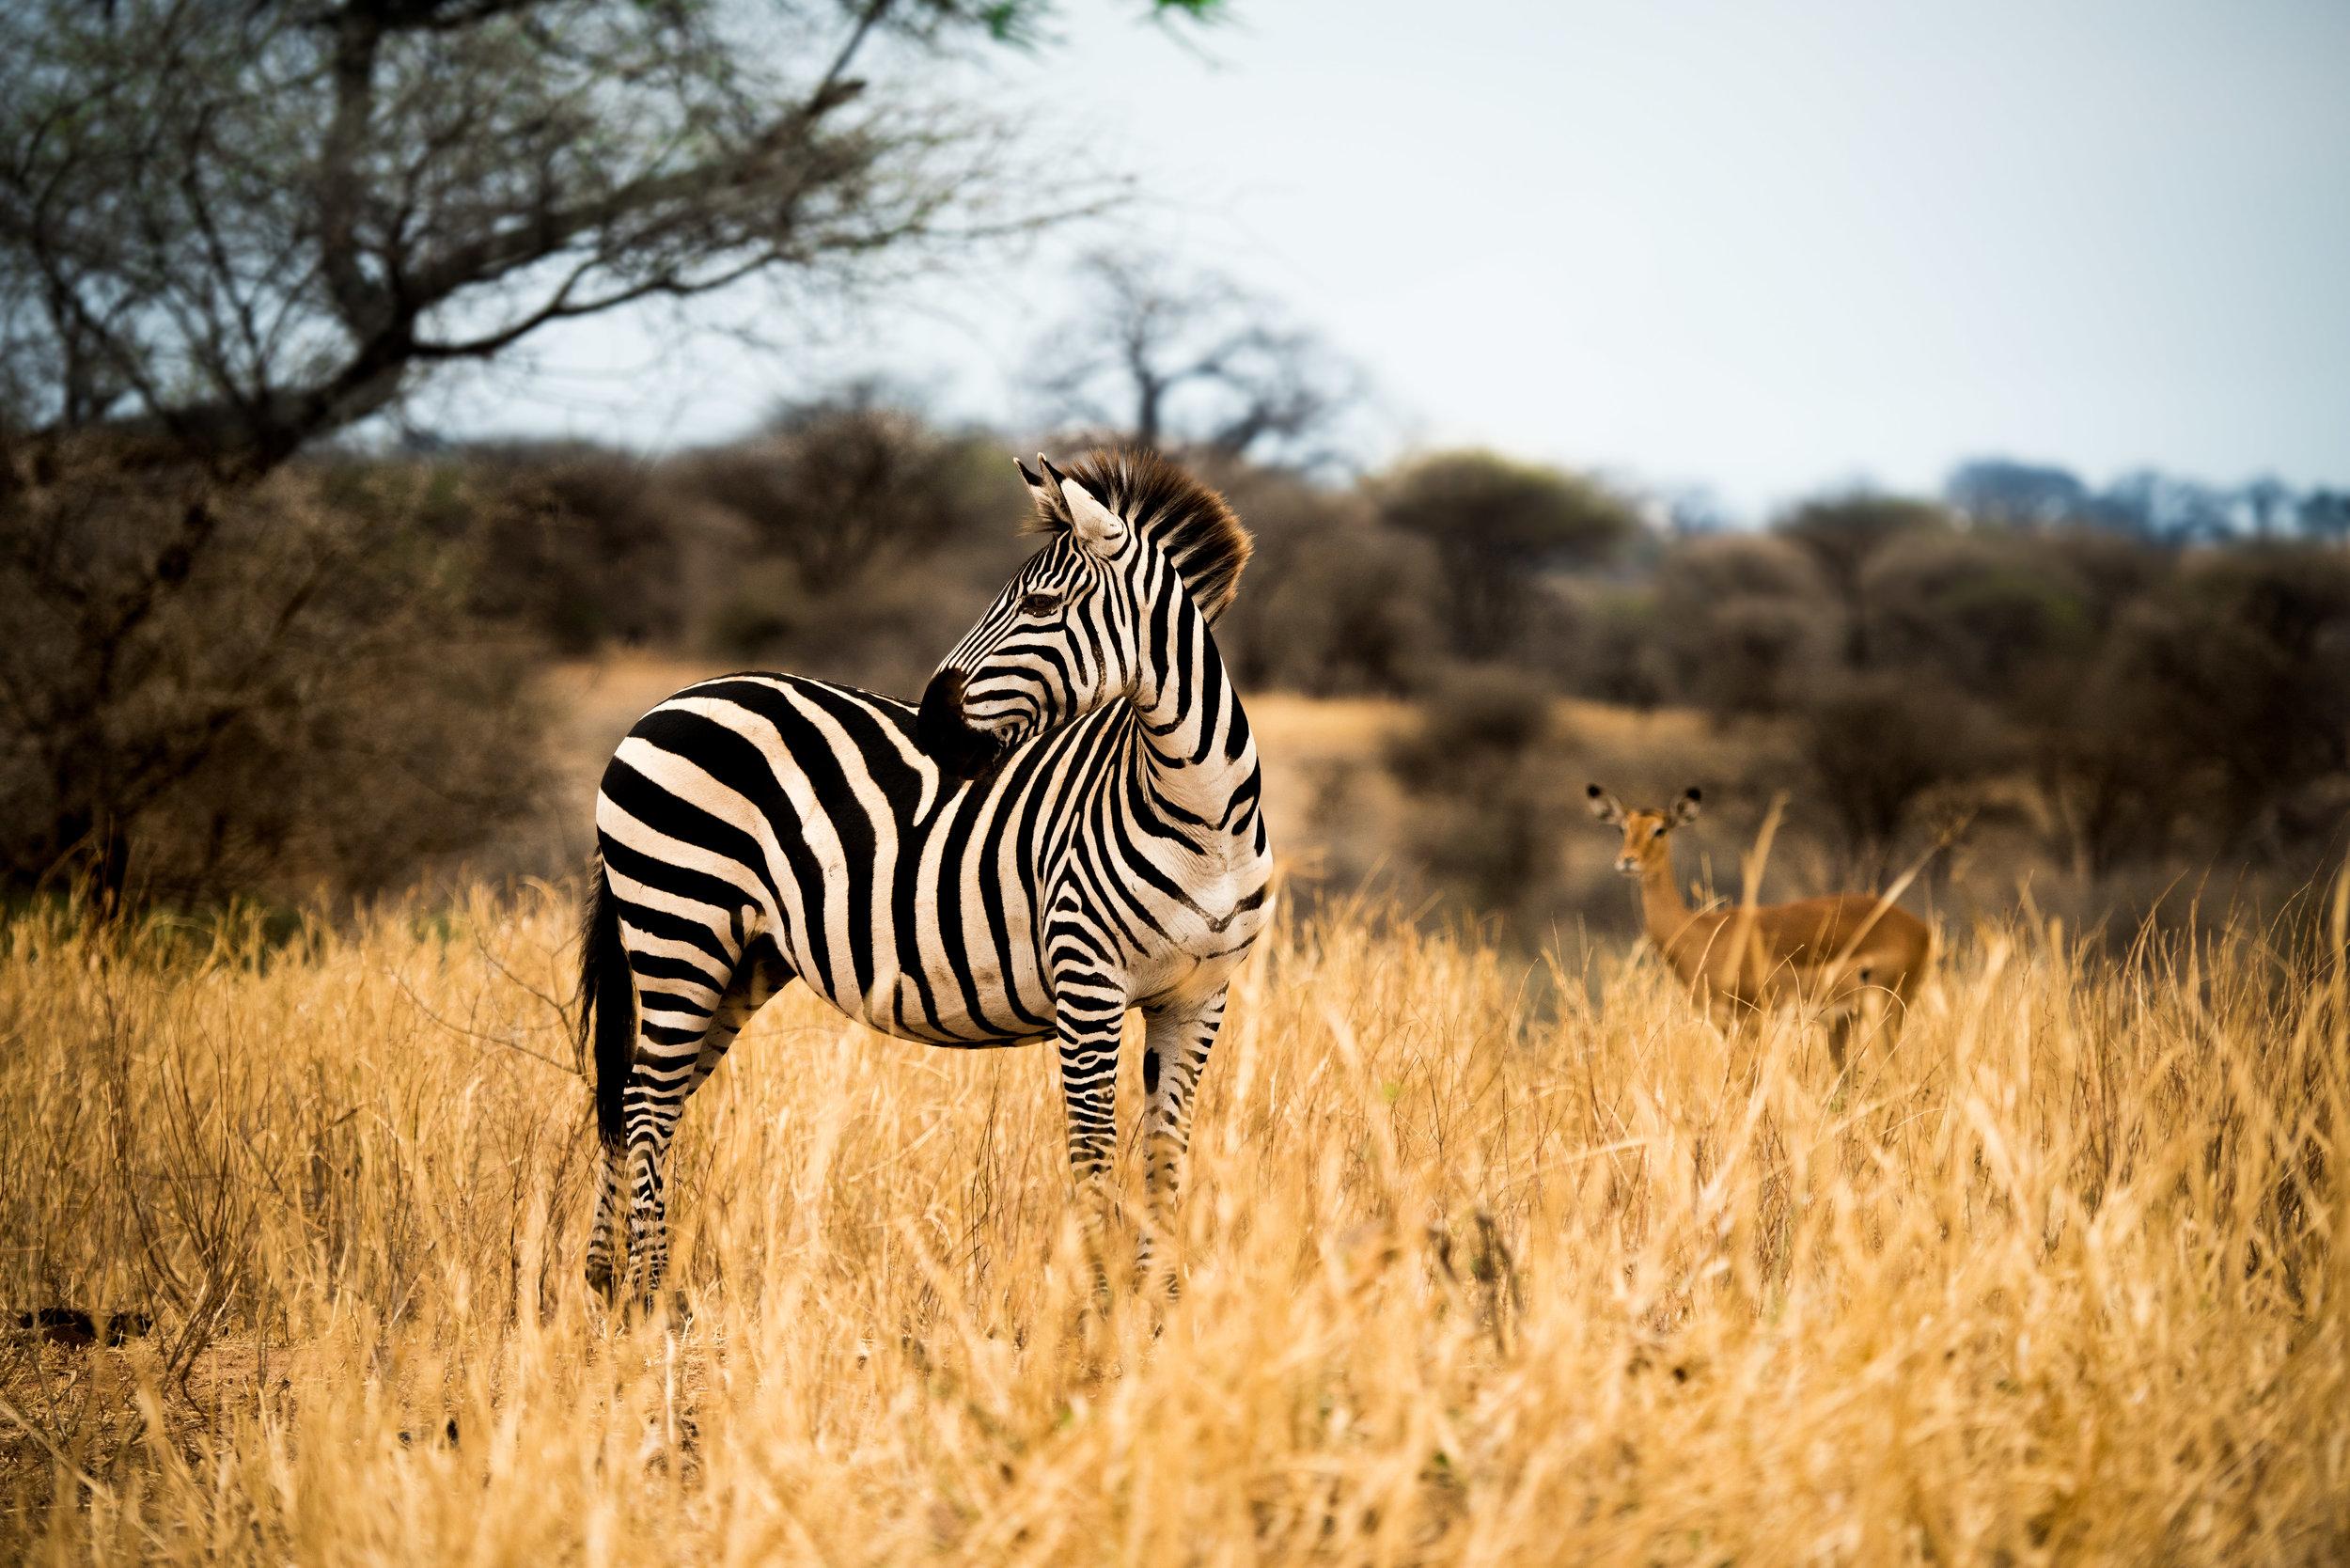 Tanzania-Earth-Photo-By-Tricia-Suriani-Ramsay-7.jpg